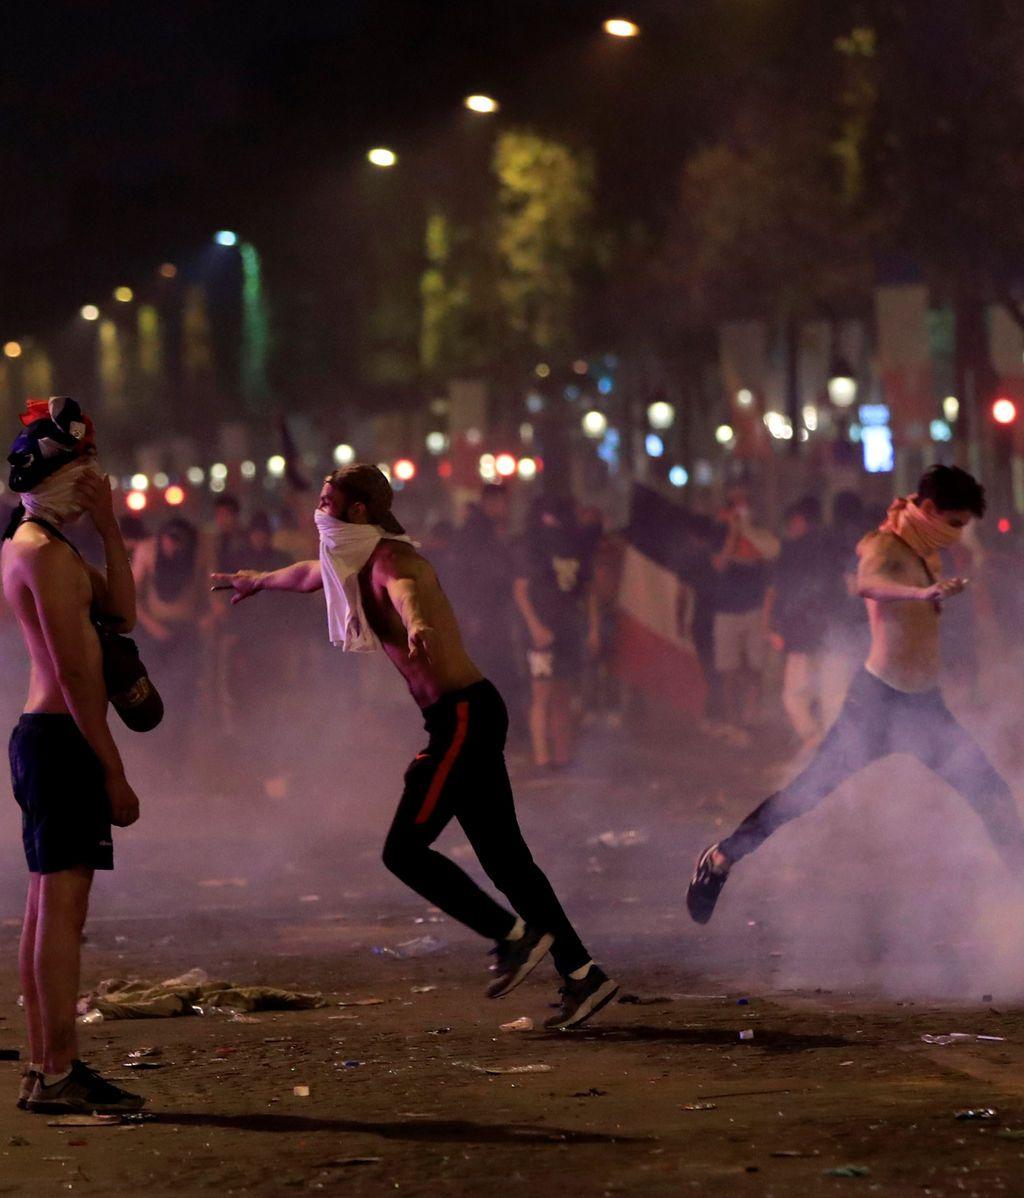 Incidentes en Francia